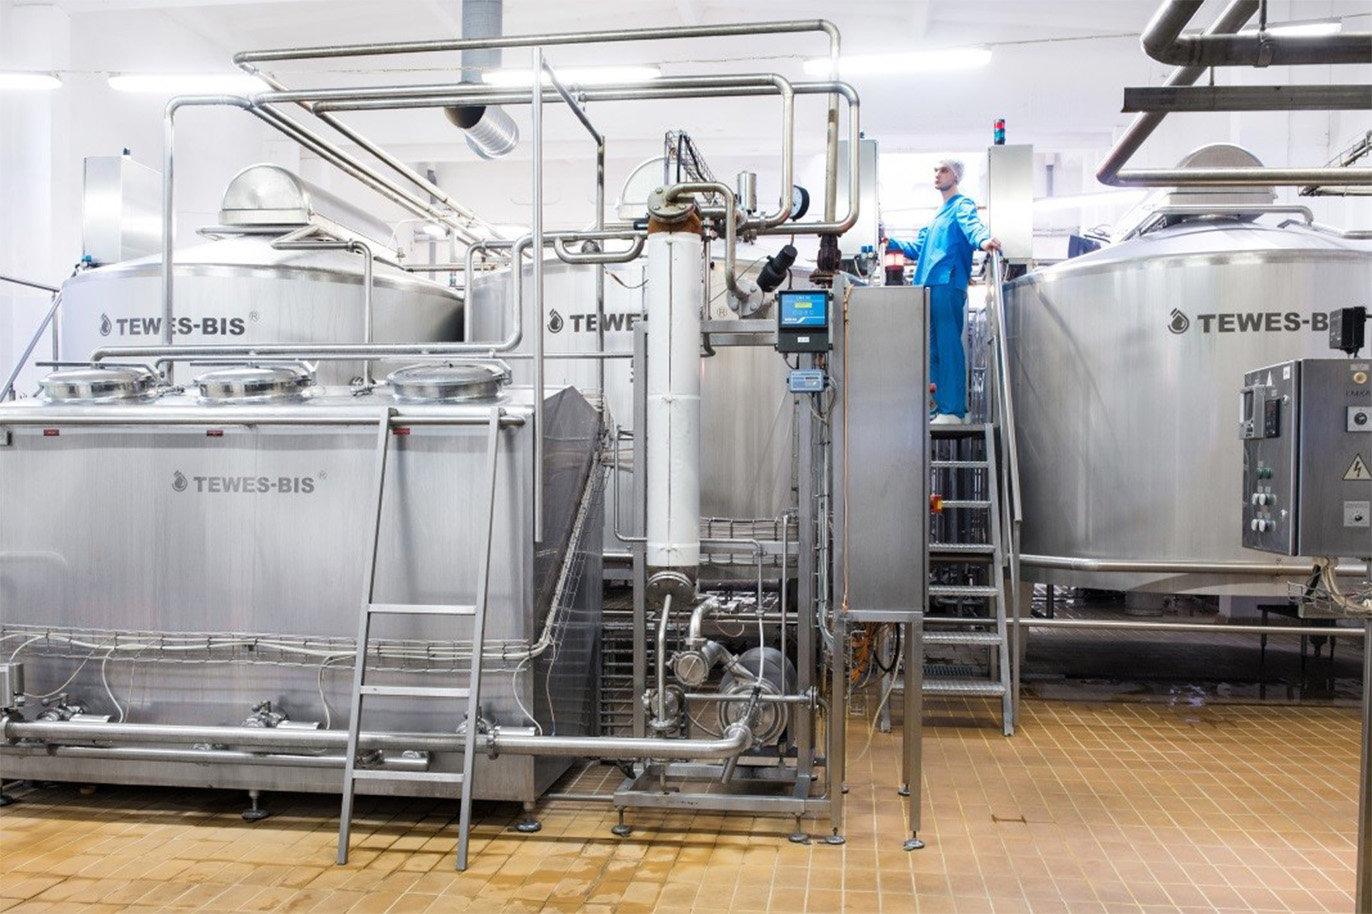 сайте представлена сергачский молочный завод фото нуля вас будут